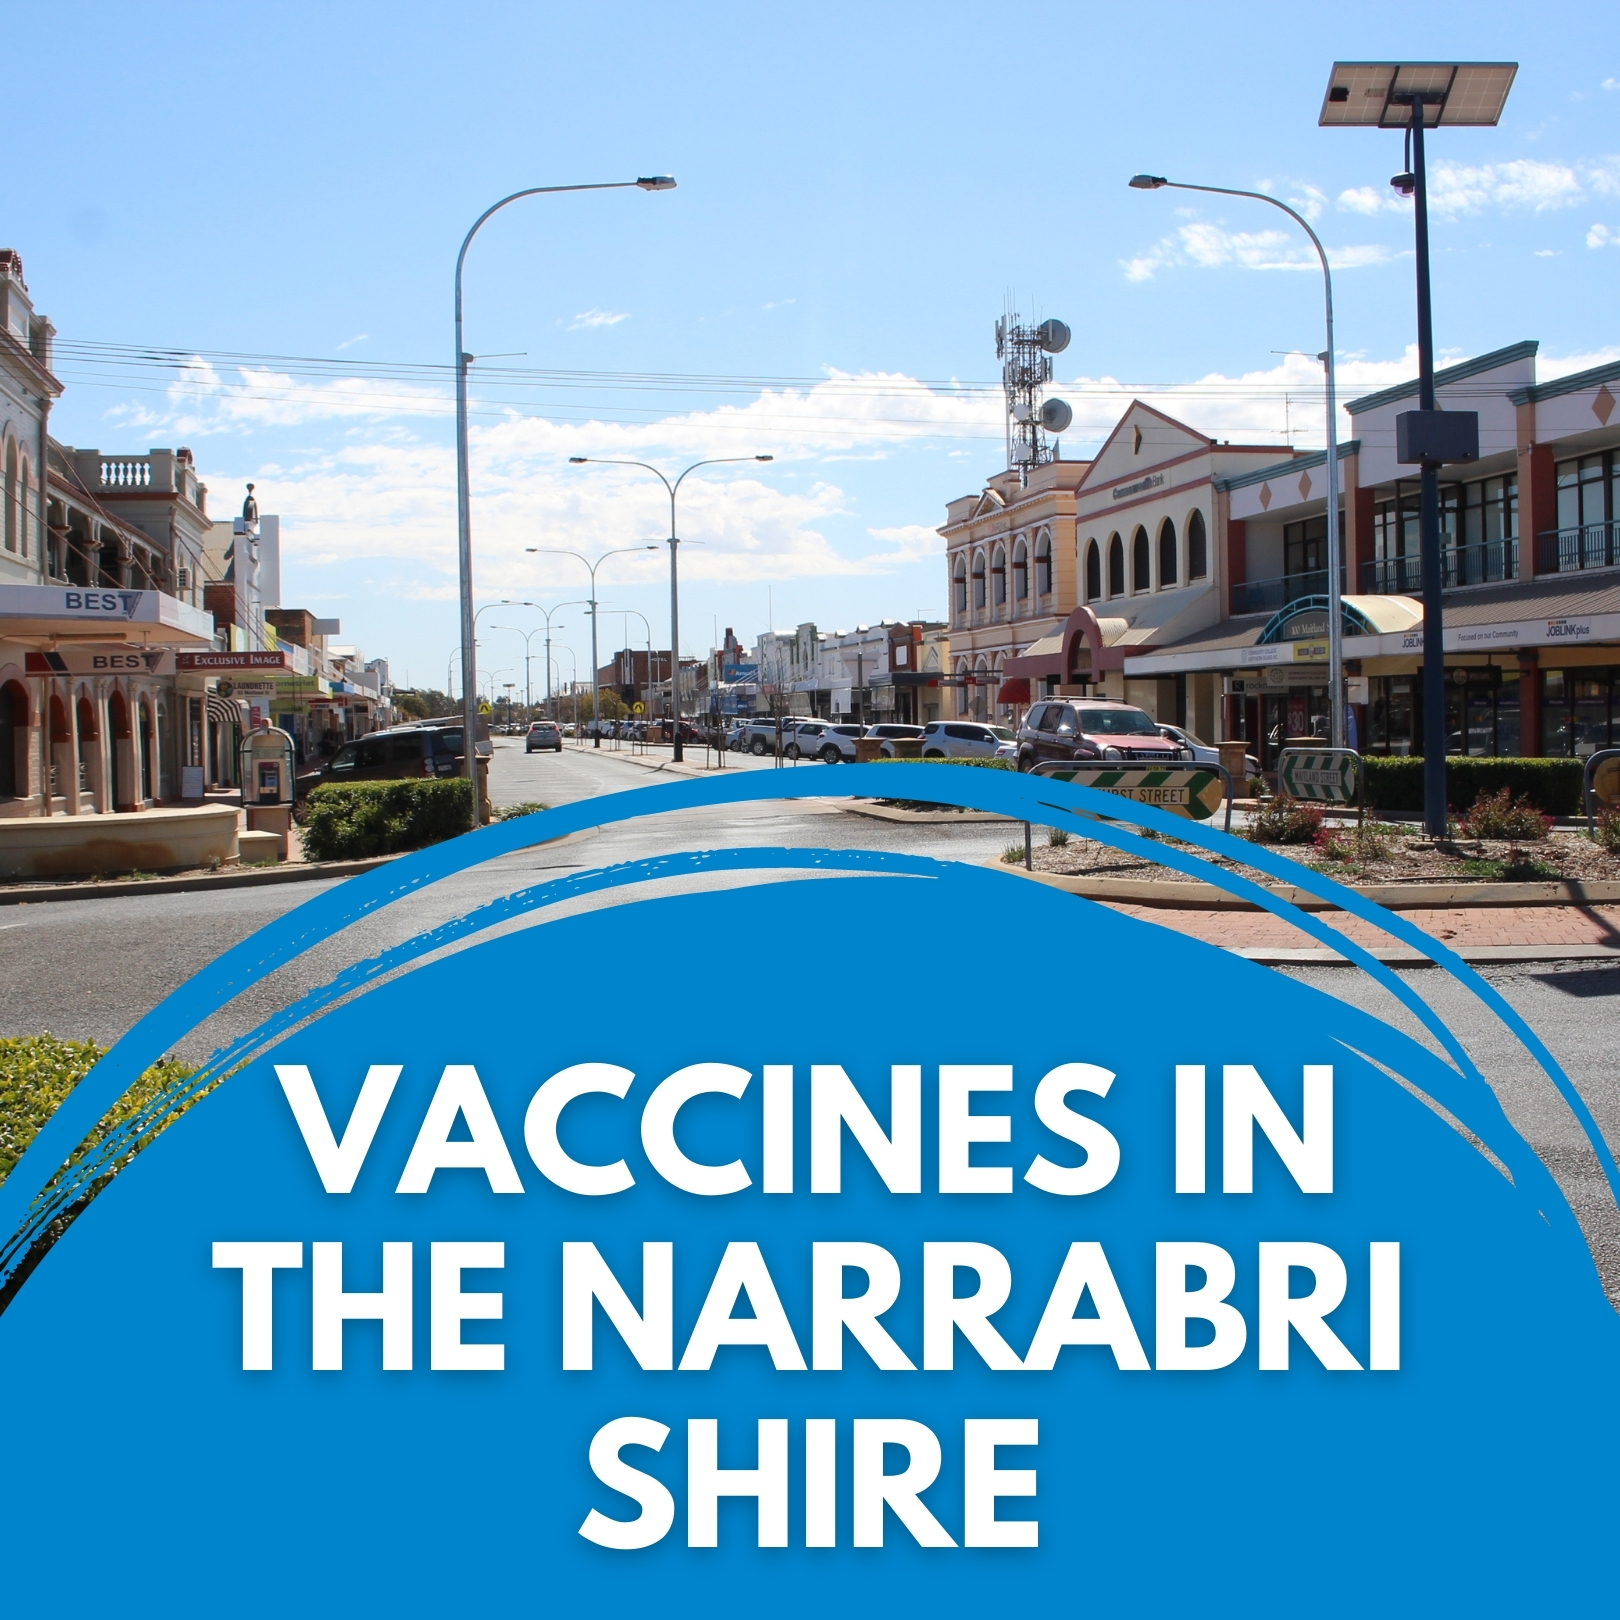 Vaccines in the Narrabri Shire Image